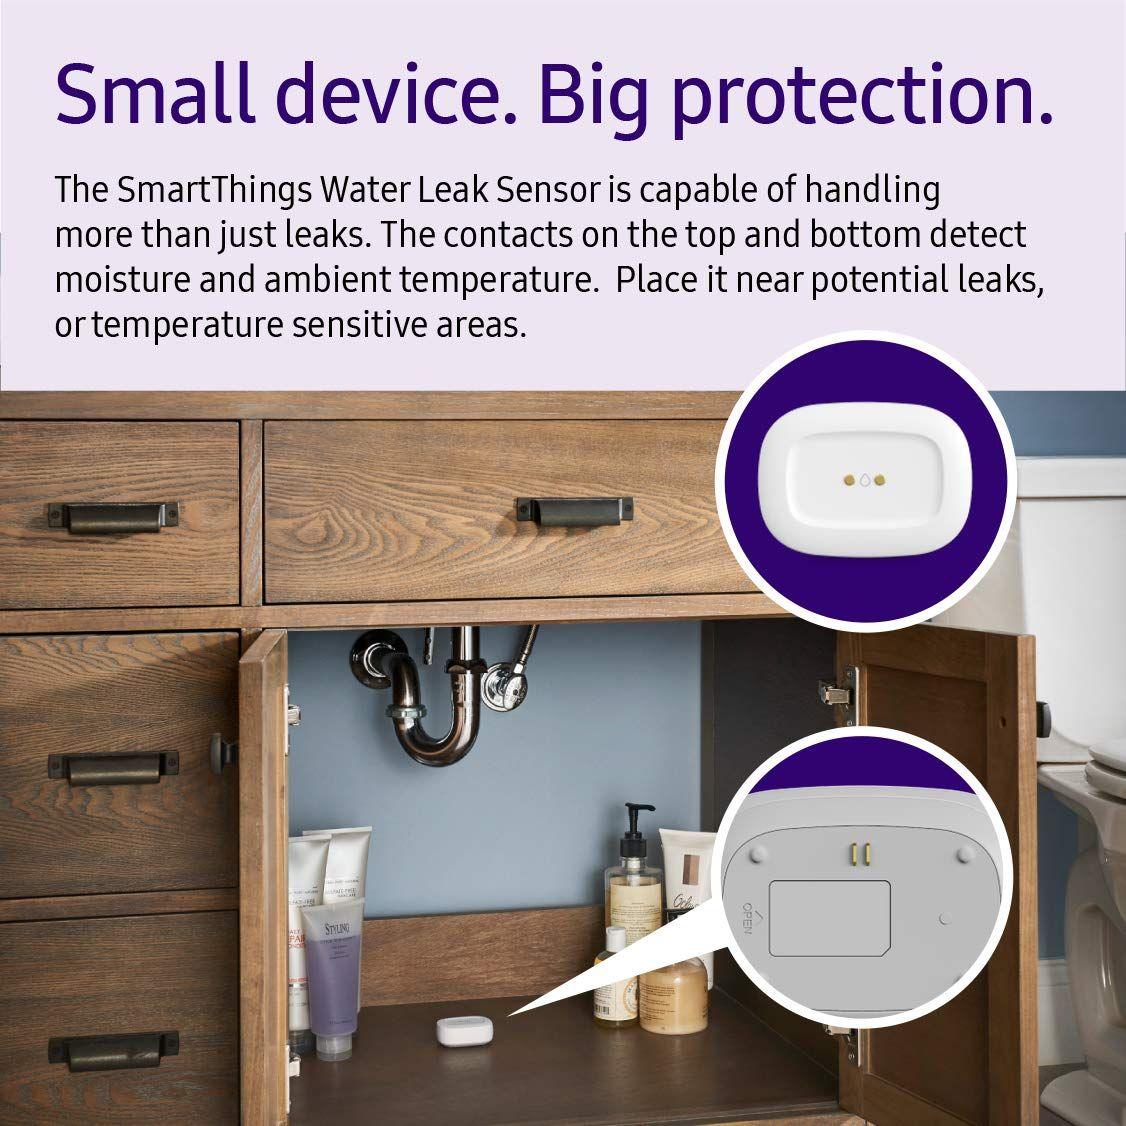 Samsung Smartthings Hub 3rd Generation Gp U999sjvlgda Smart Home Automation Hub Home Monitoring Smart Devices Alexa Google Smartthings Hub Home Smart Home